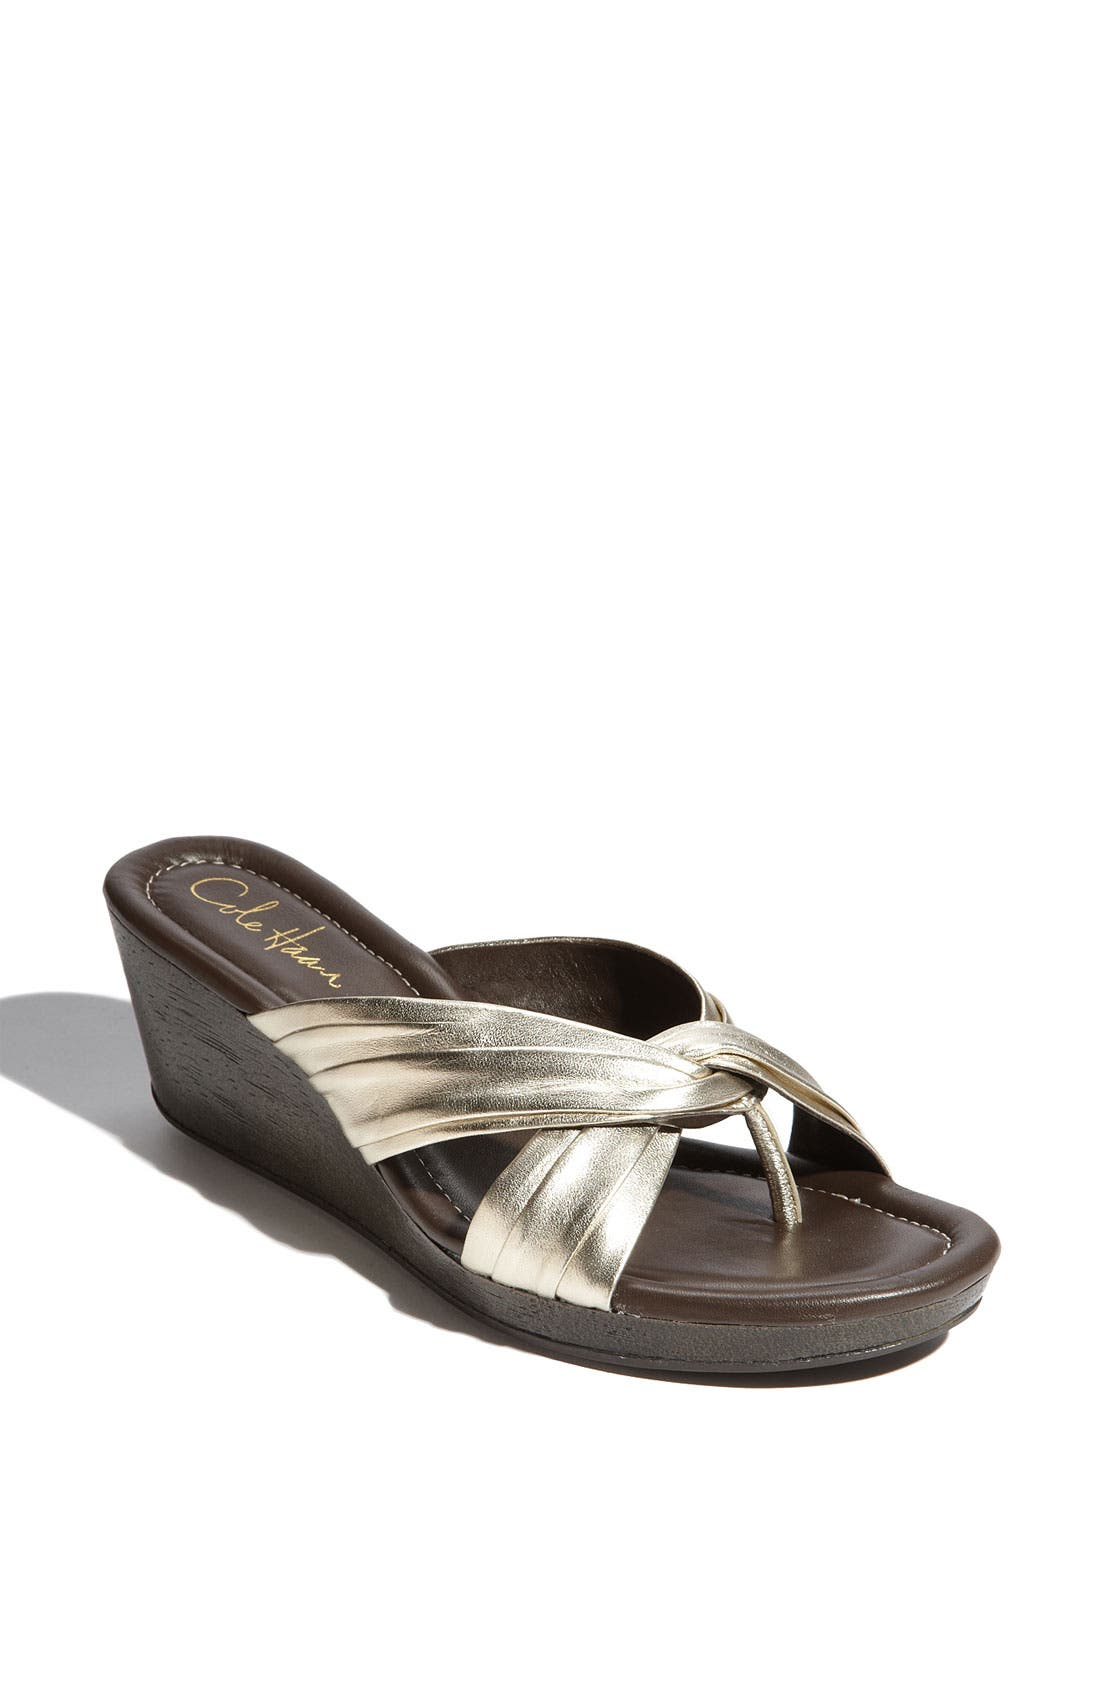 Main Image - Cole Haan 'Air Eden' Thong Sandal